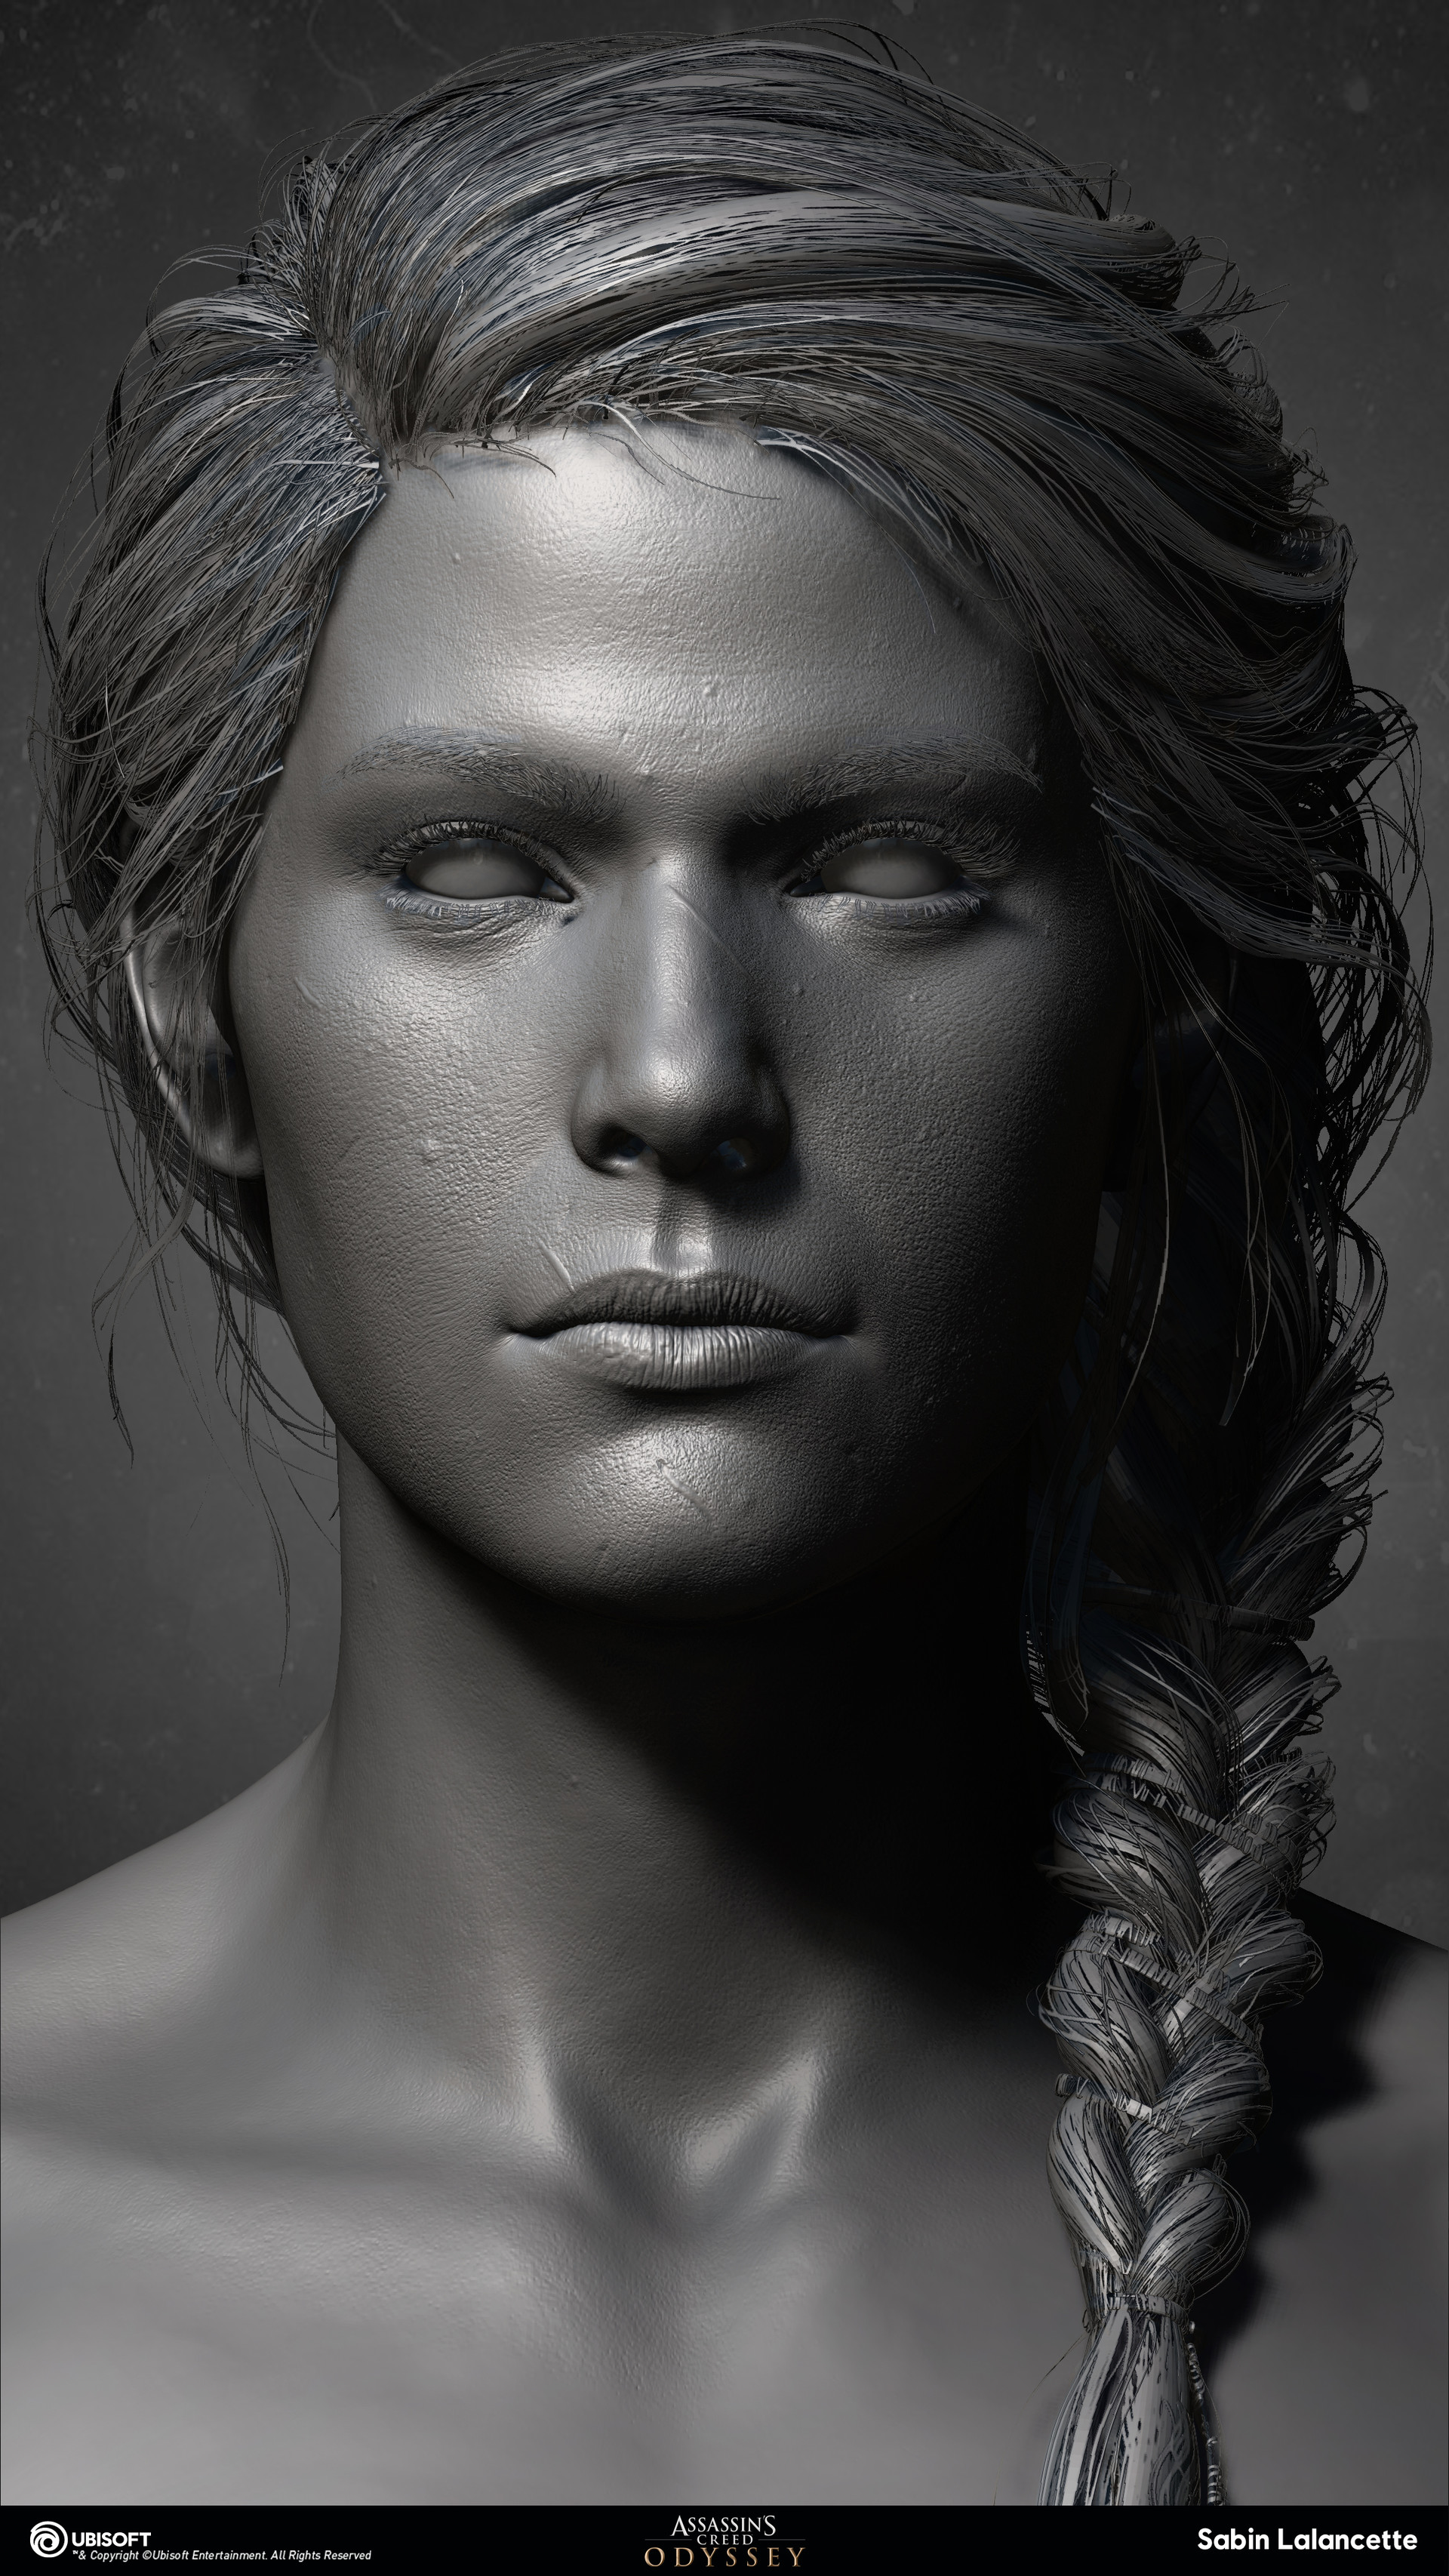 sabin-lalancette-artblast-fullsizezb-hex-portrait-neutral-kassandra-slalancette